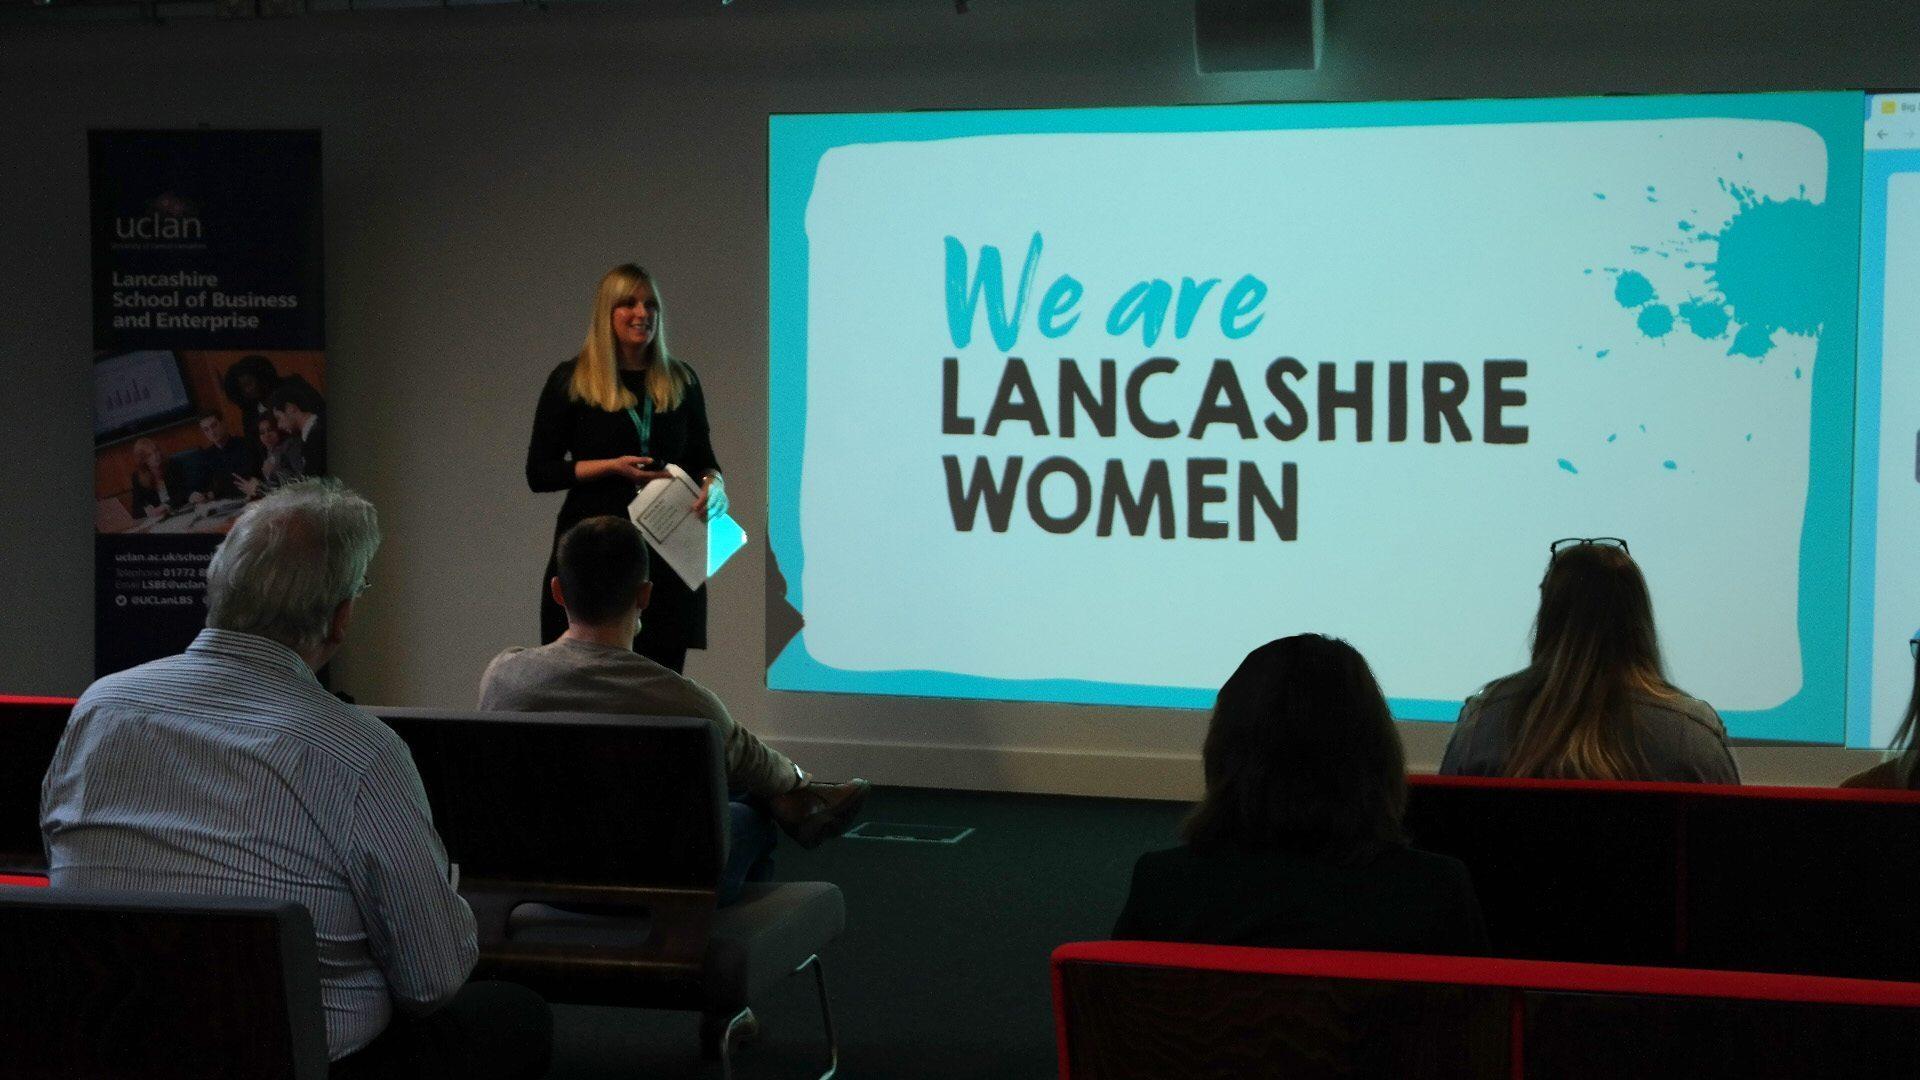 we are lancashire women